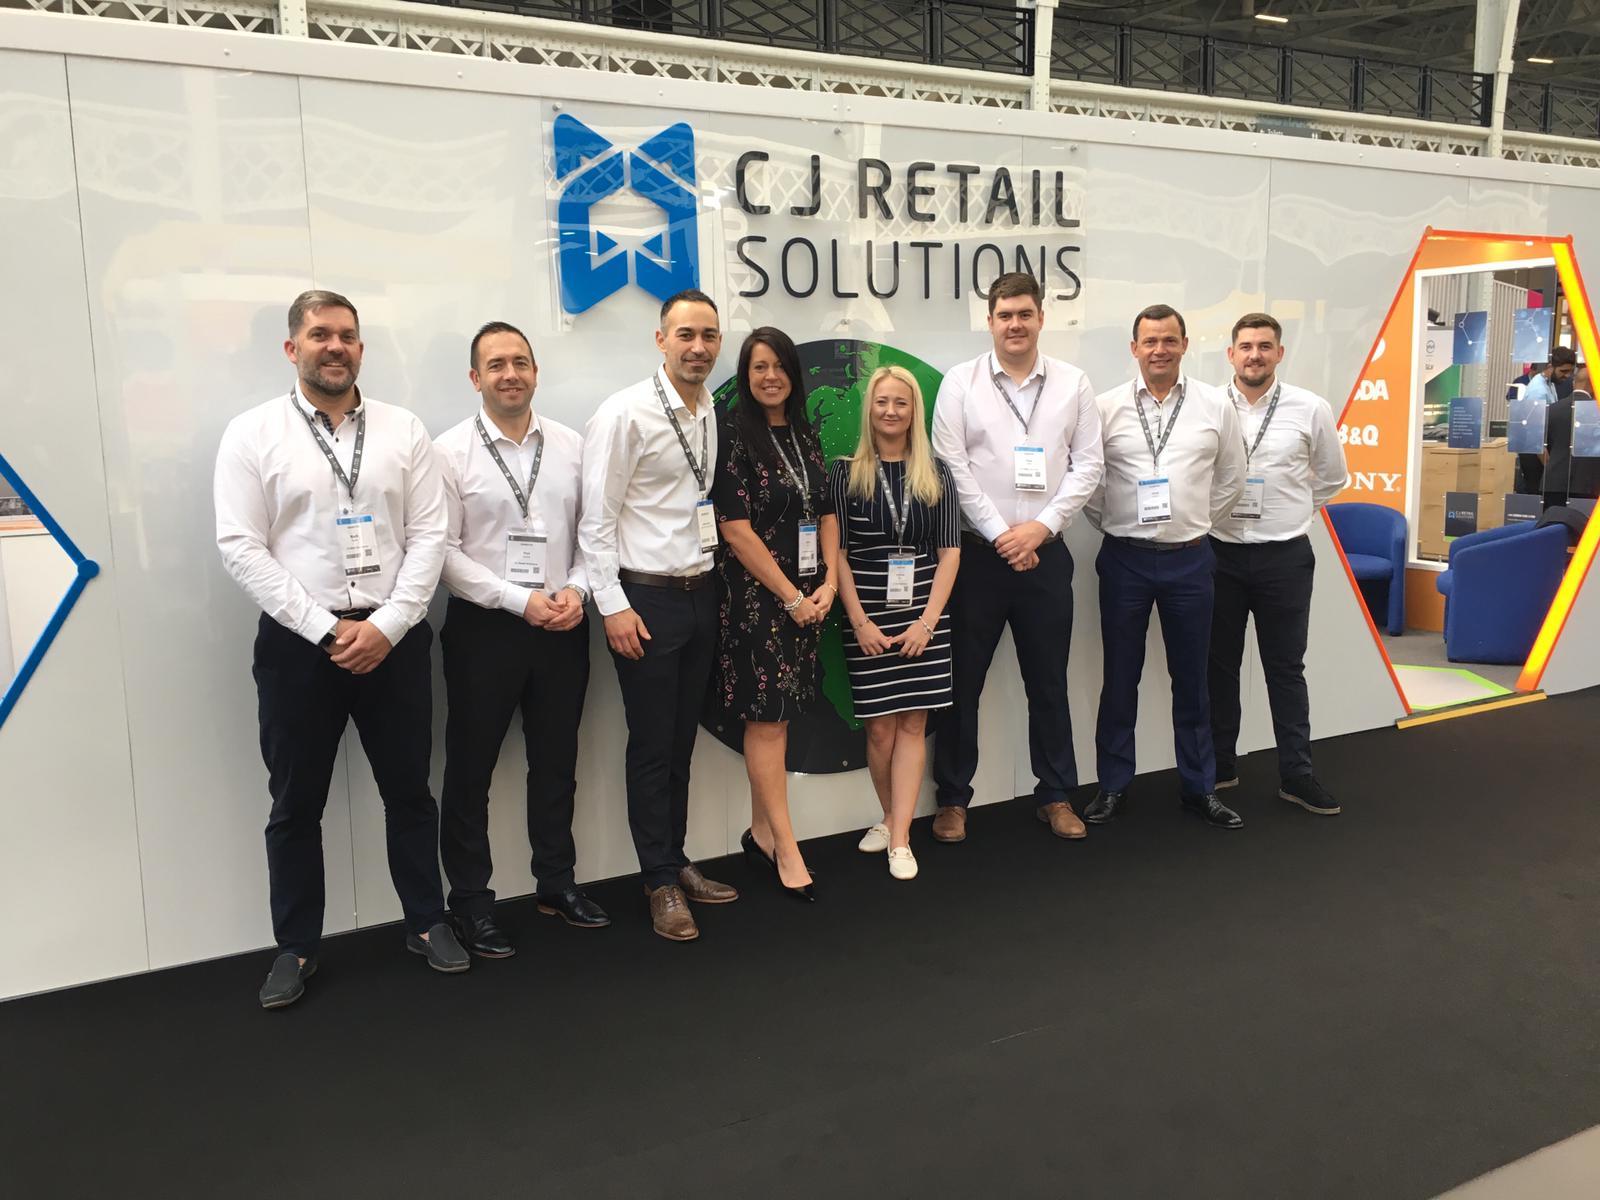 CJ Retail Solutions team at RetailEXPO 2019